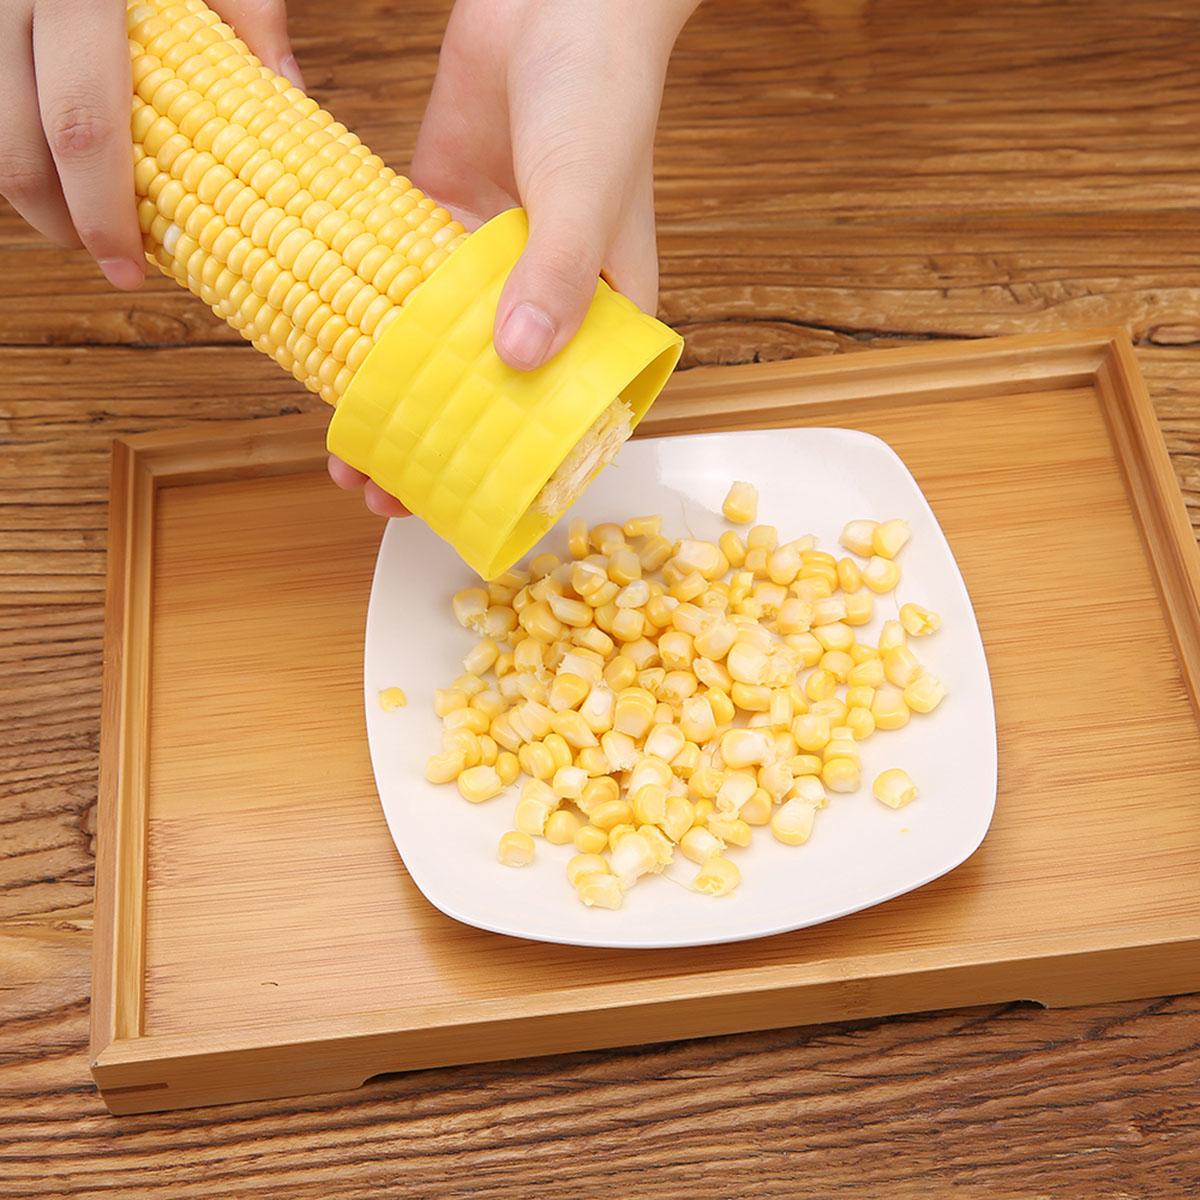 Details about Utility Kitchen Tool Corn Cob Kerneler Peeler Thresher  Stripper Remover Cutter